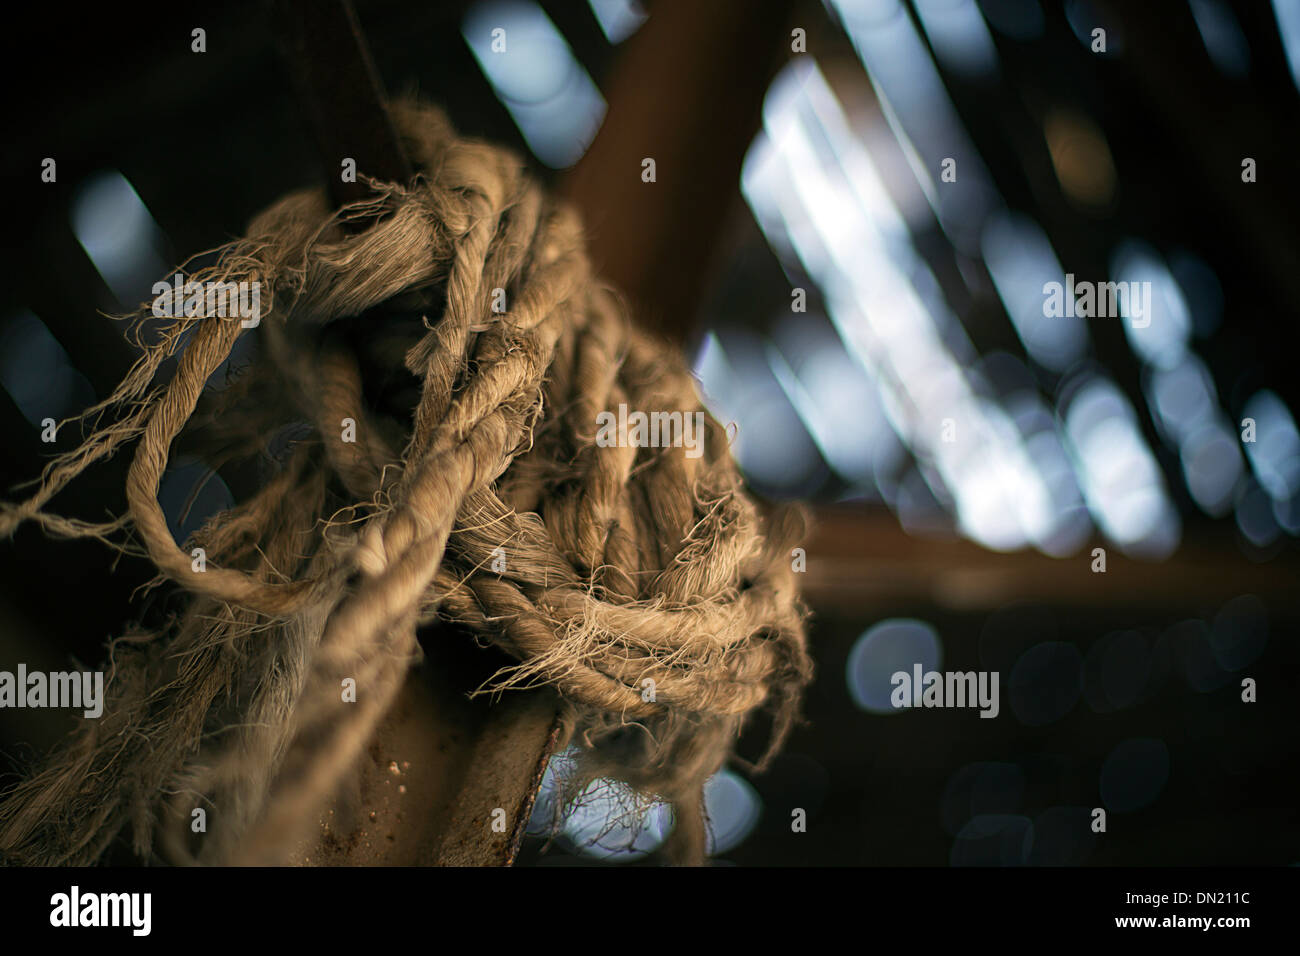 robe rust raptured  flair bokeh - Stock Image